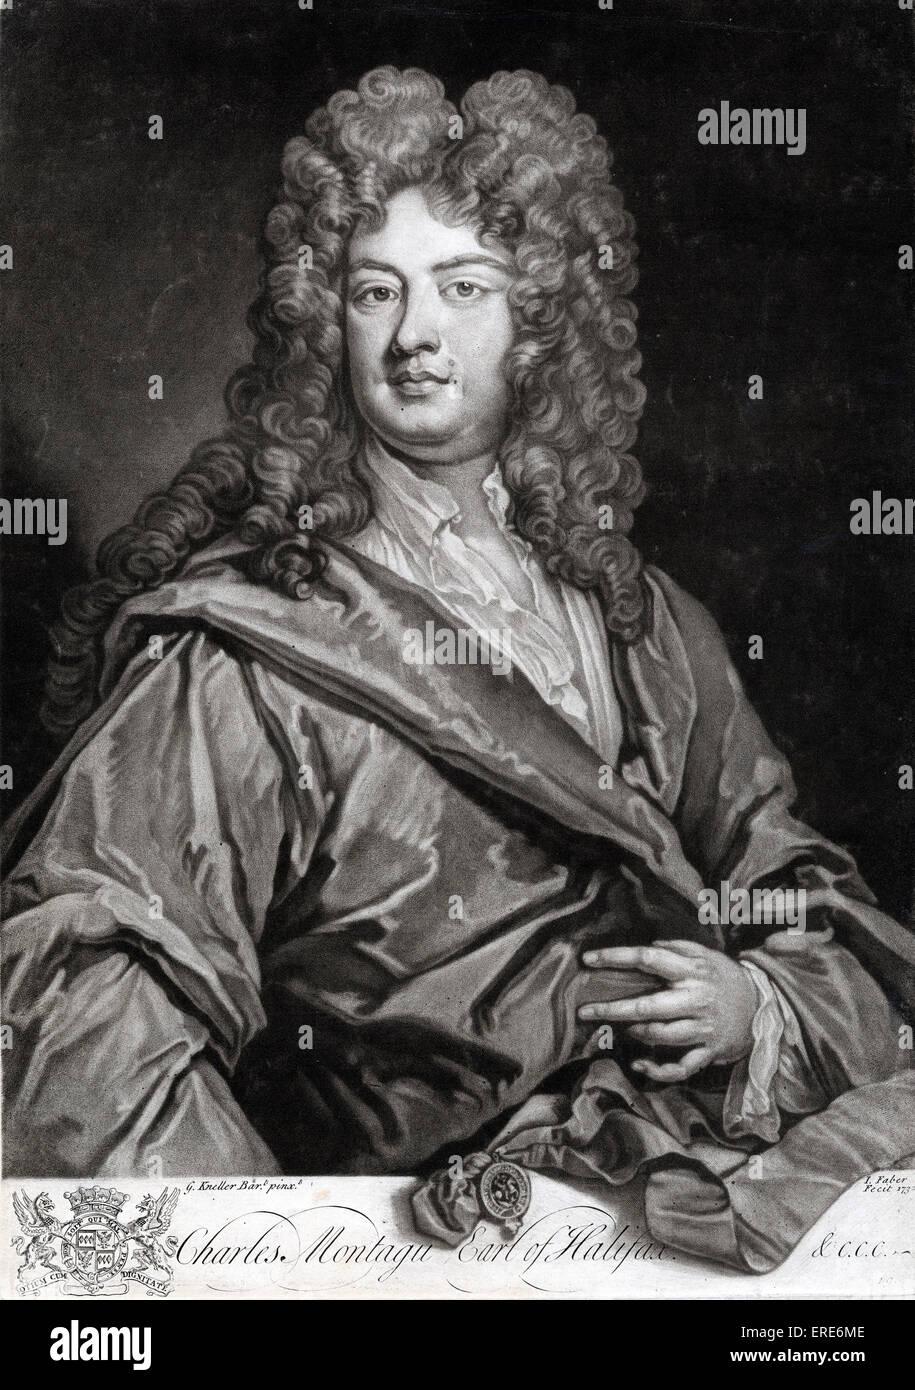 Charles Montagu, first Earl of Halifax, portrait. English poet and statesman, 16 April 1661 - 19 May 1715.  Mezzotint - Stock Image